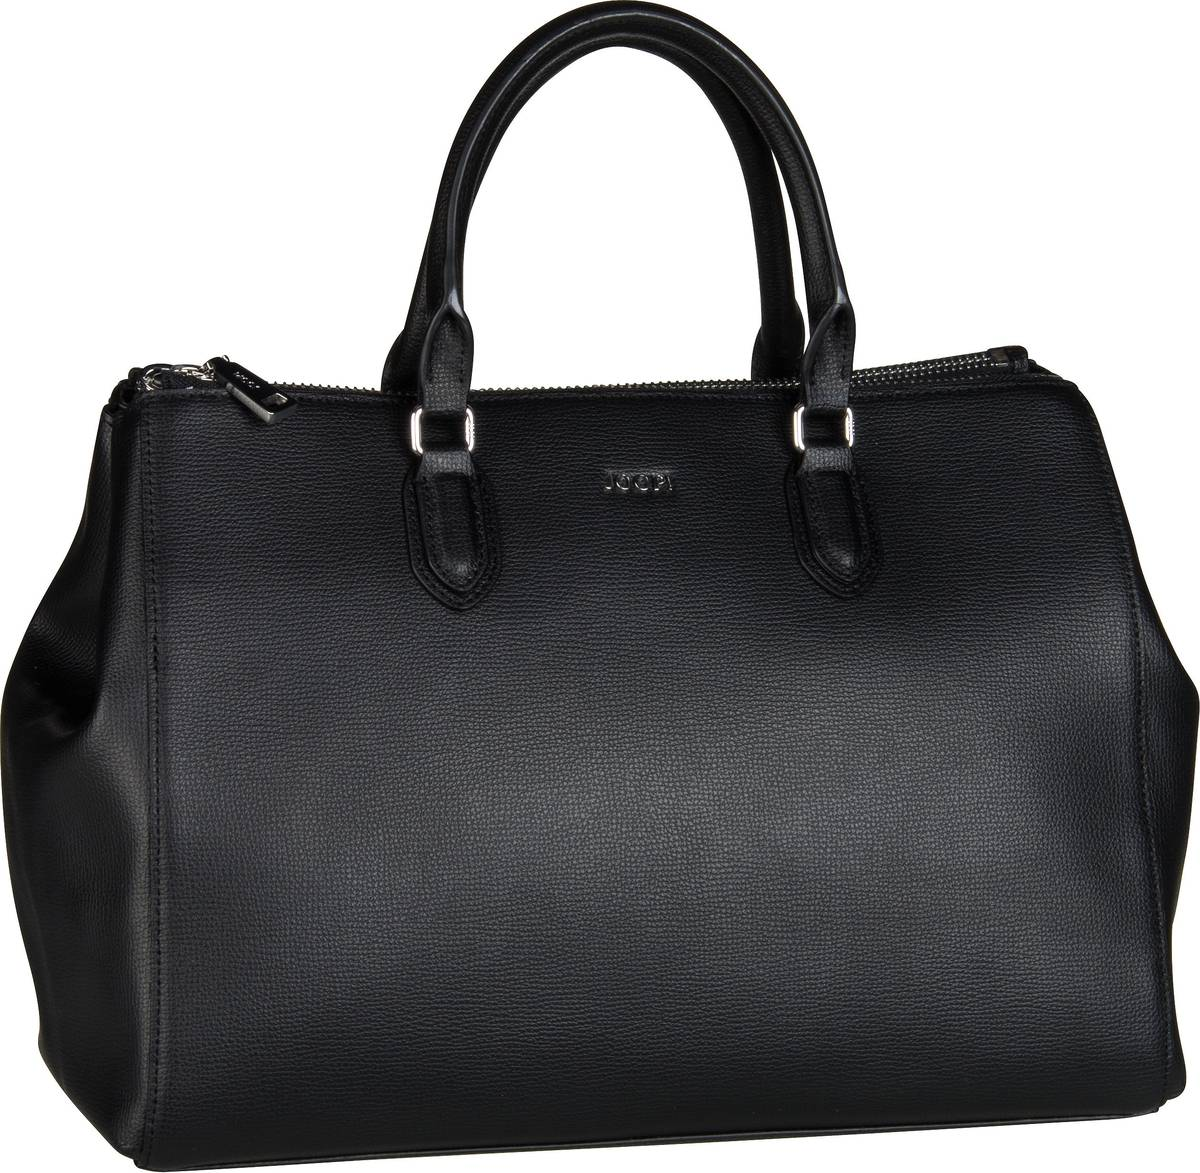 Handtasche Granella Maia HandBag LHO Black